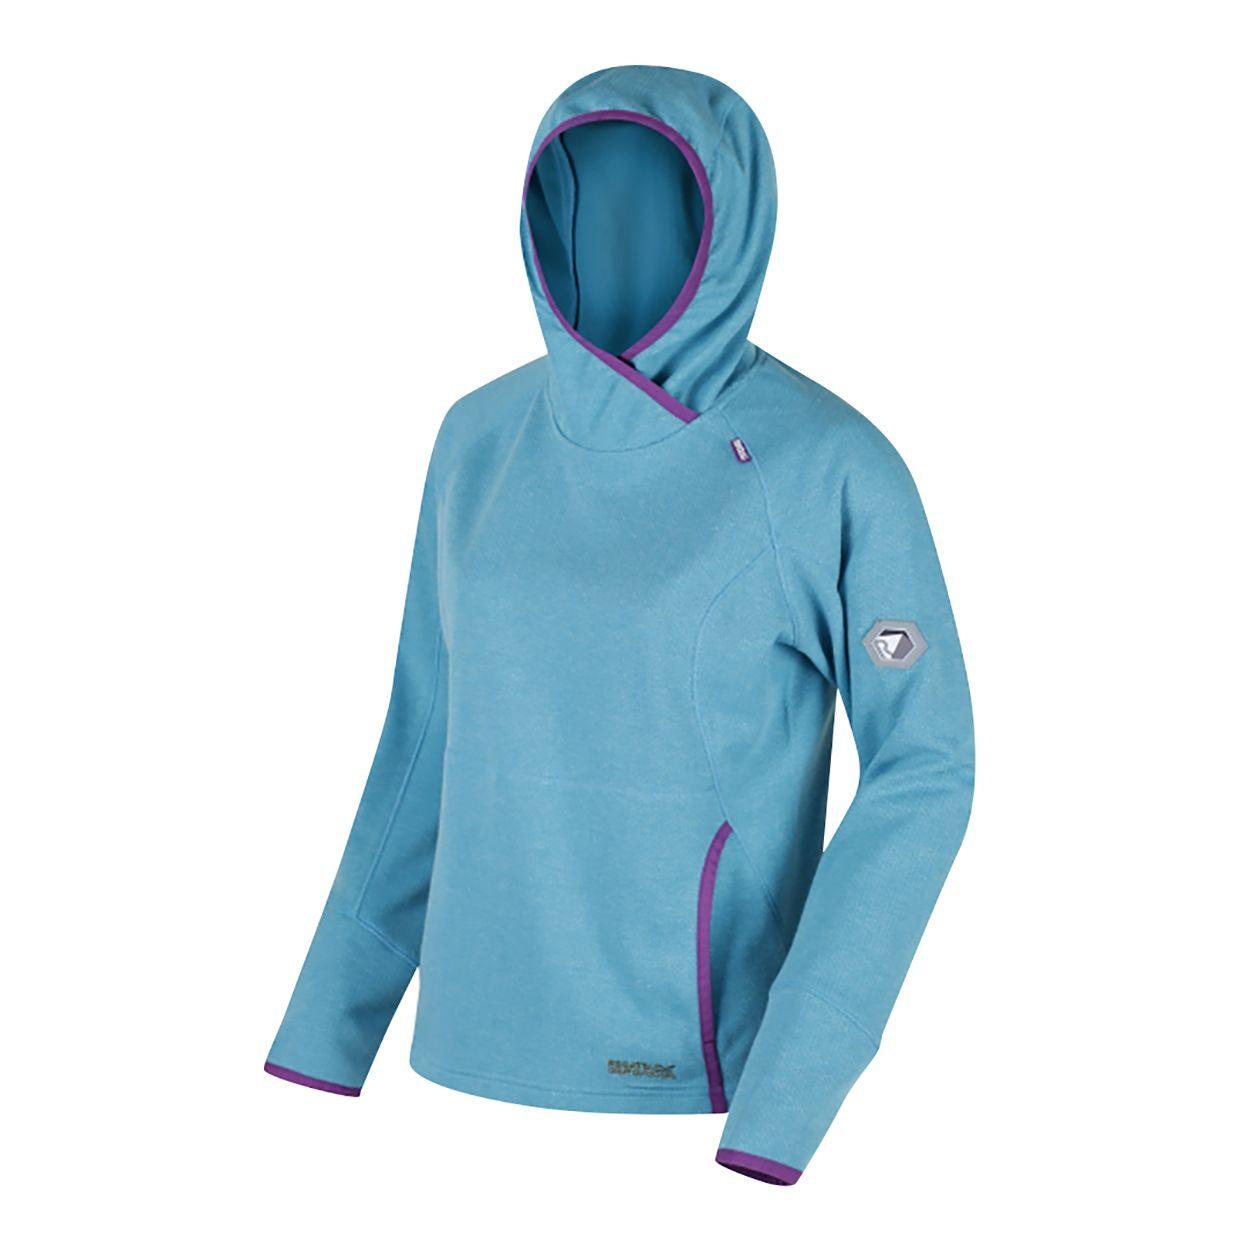 Regatta Womens/Ladies Montem III Hooded Fleece